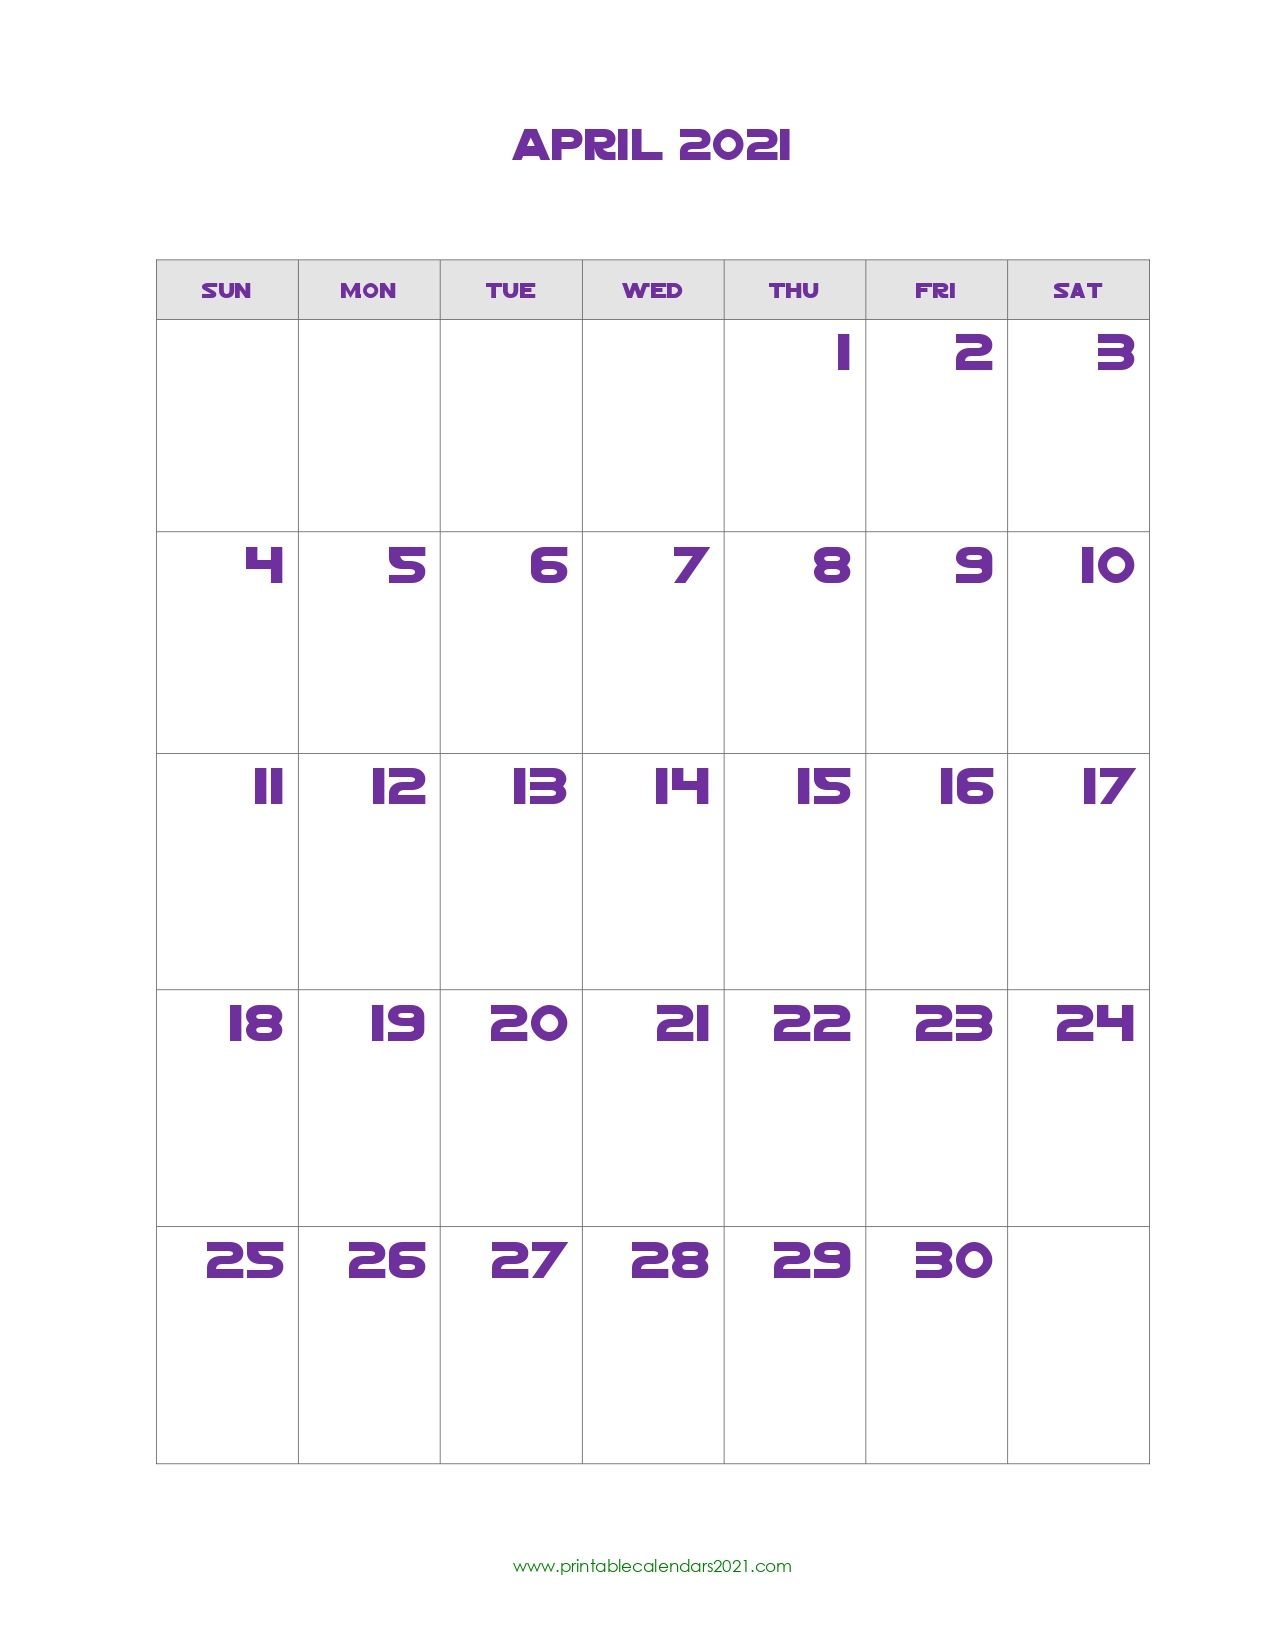 Printable Calendar April 2021 Printable 2021 Calendar With Holidays In 2020 Printable Calendar Calendar Printables Calendar